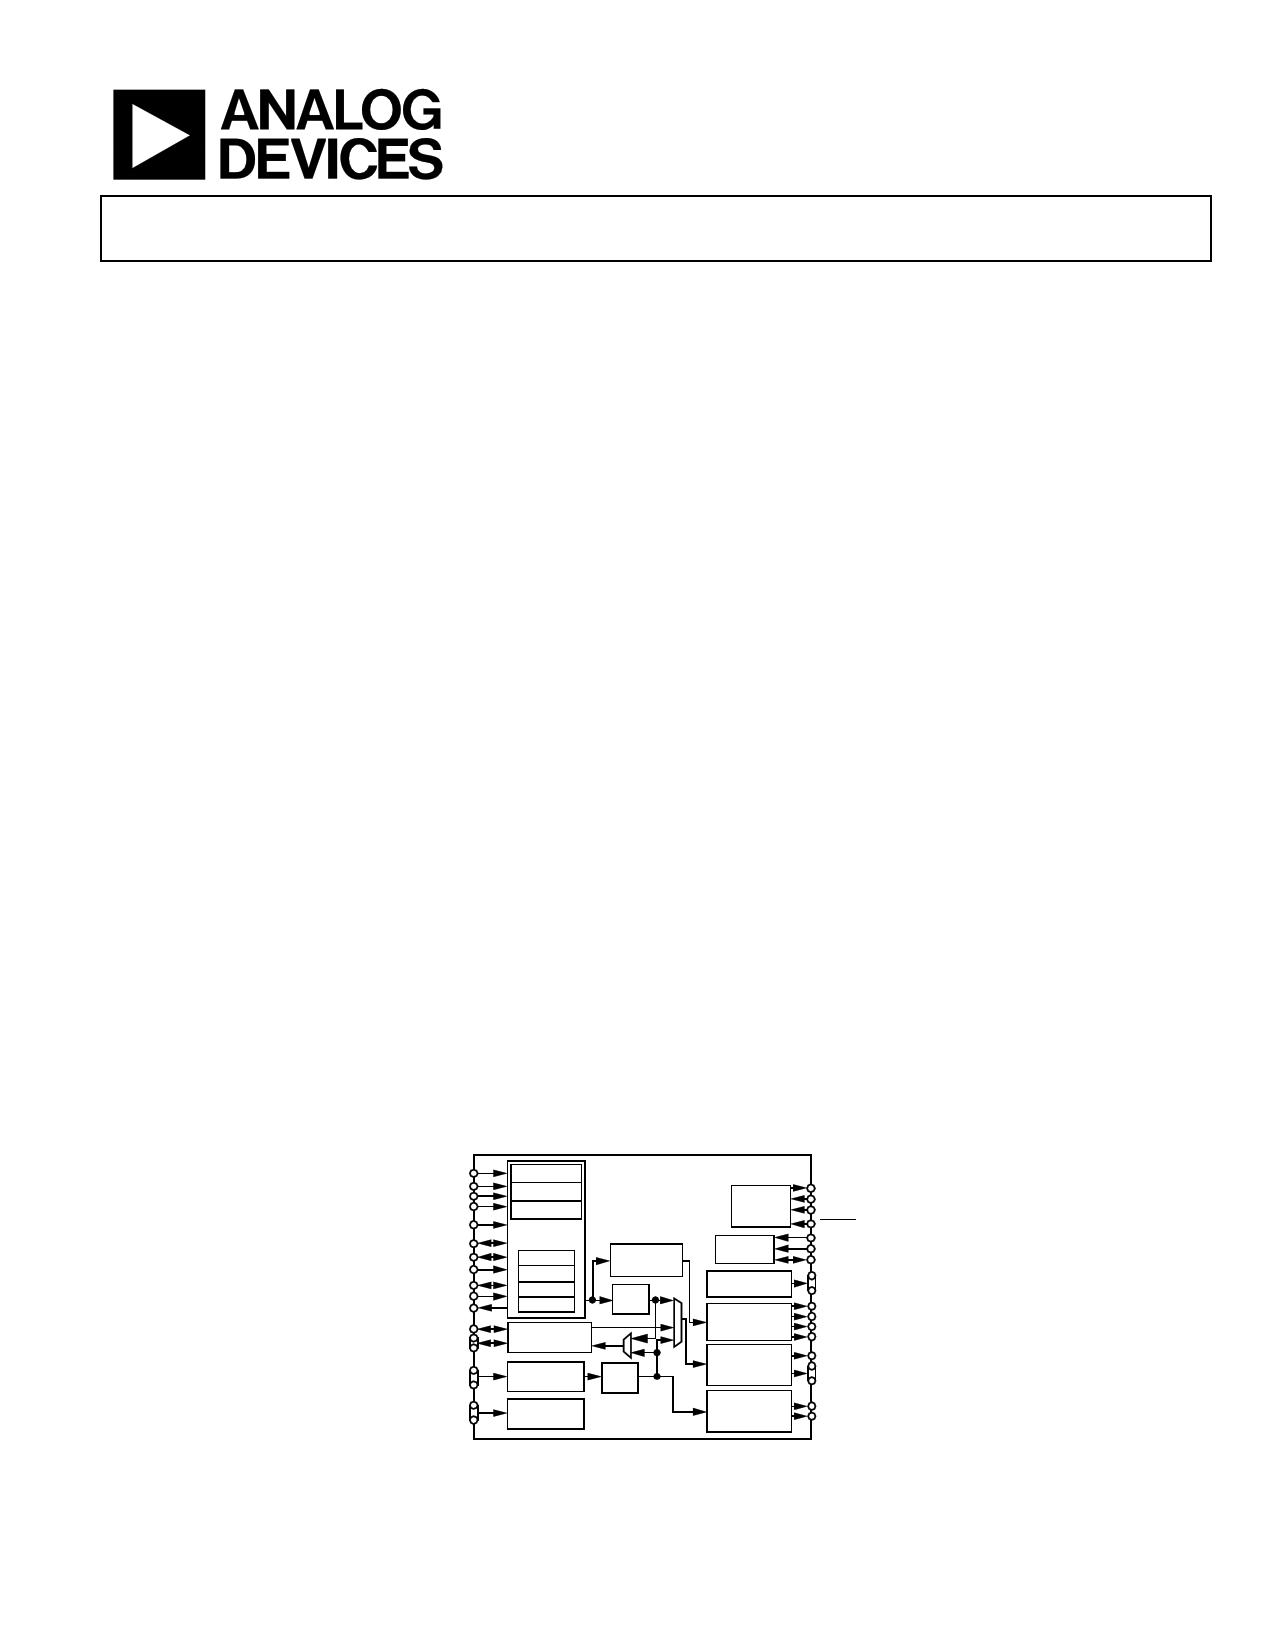 ADV7481 datasheet